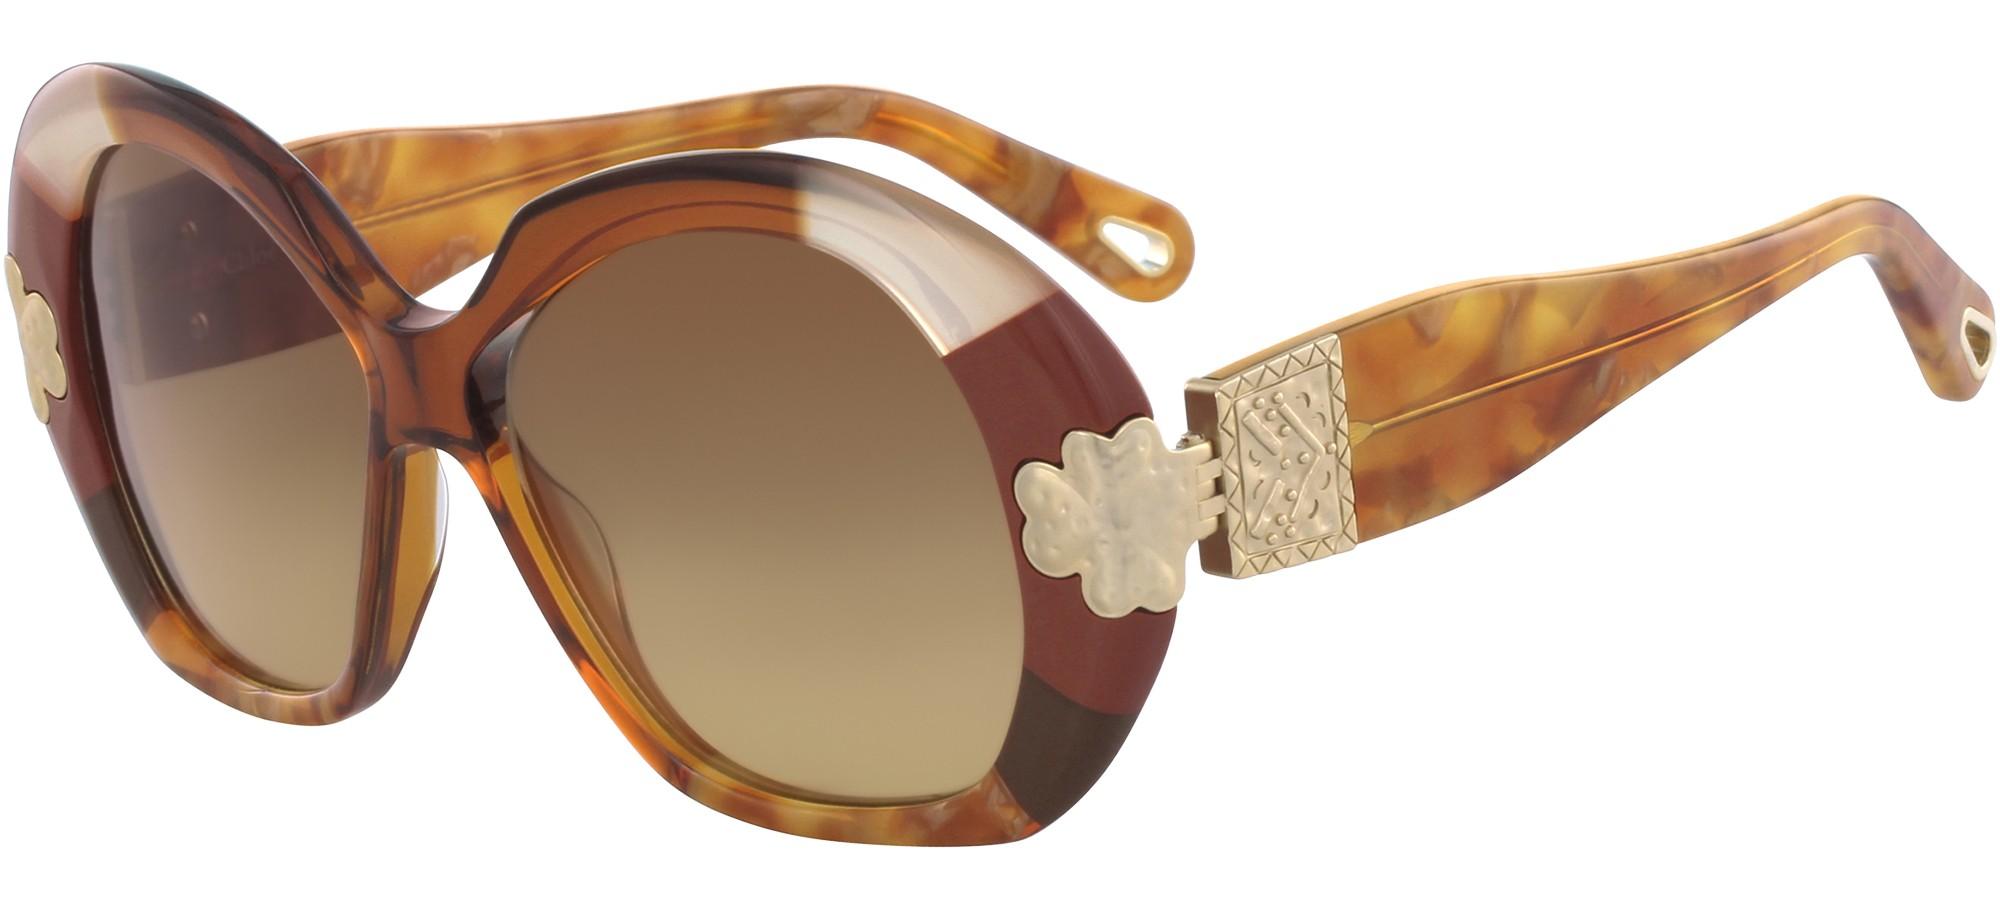 Chloé sunglasses VENUS CE743S